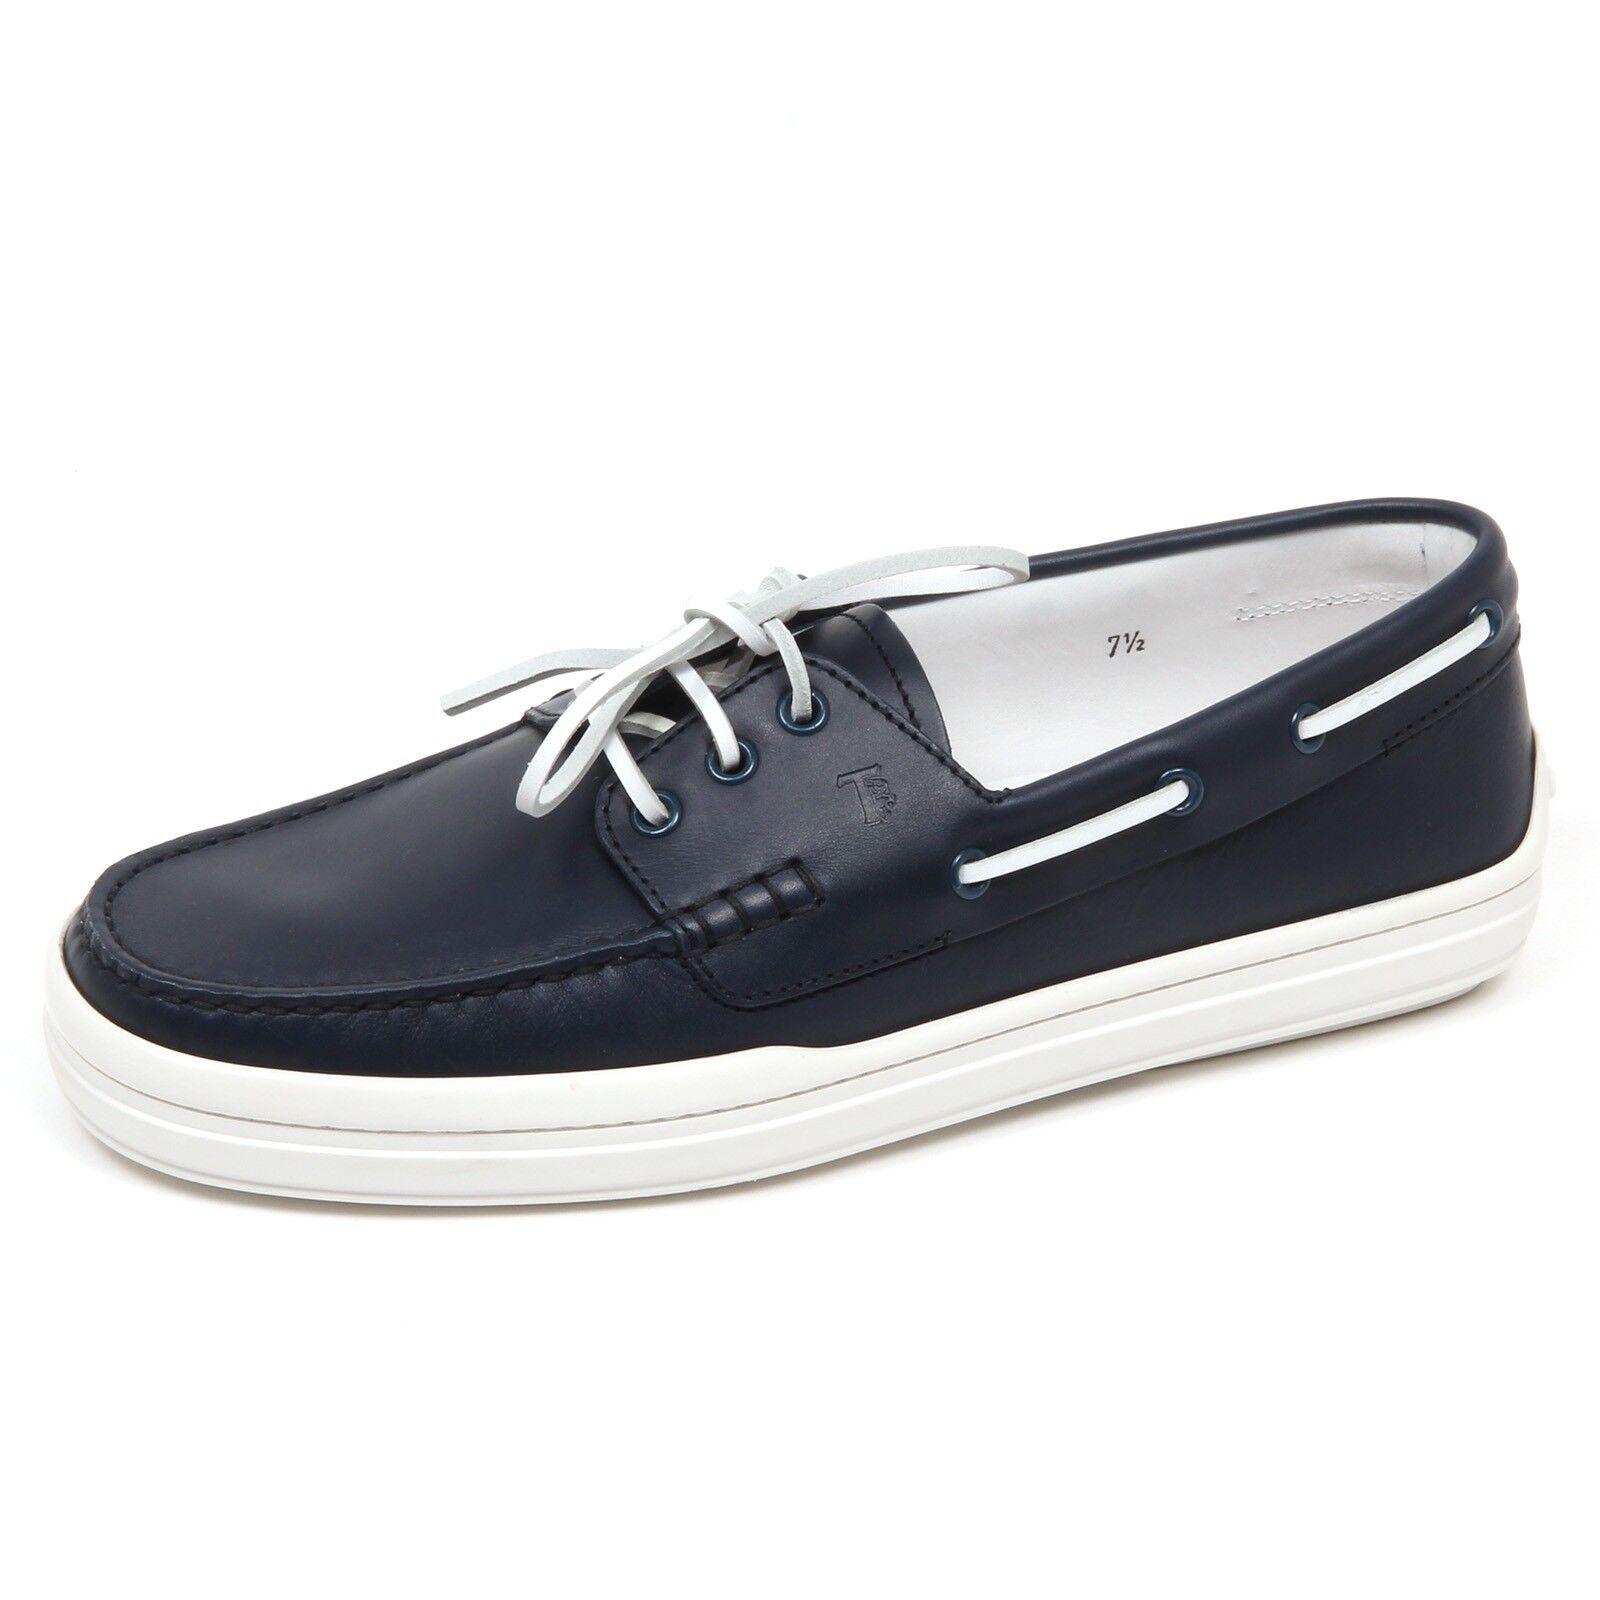 E3664 E3664 E3664 mocassino barca uomo blu TOD'S scarpe loafer shoe man 872c39